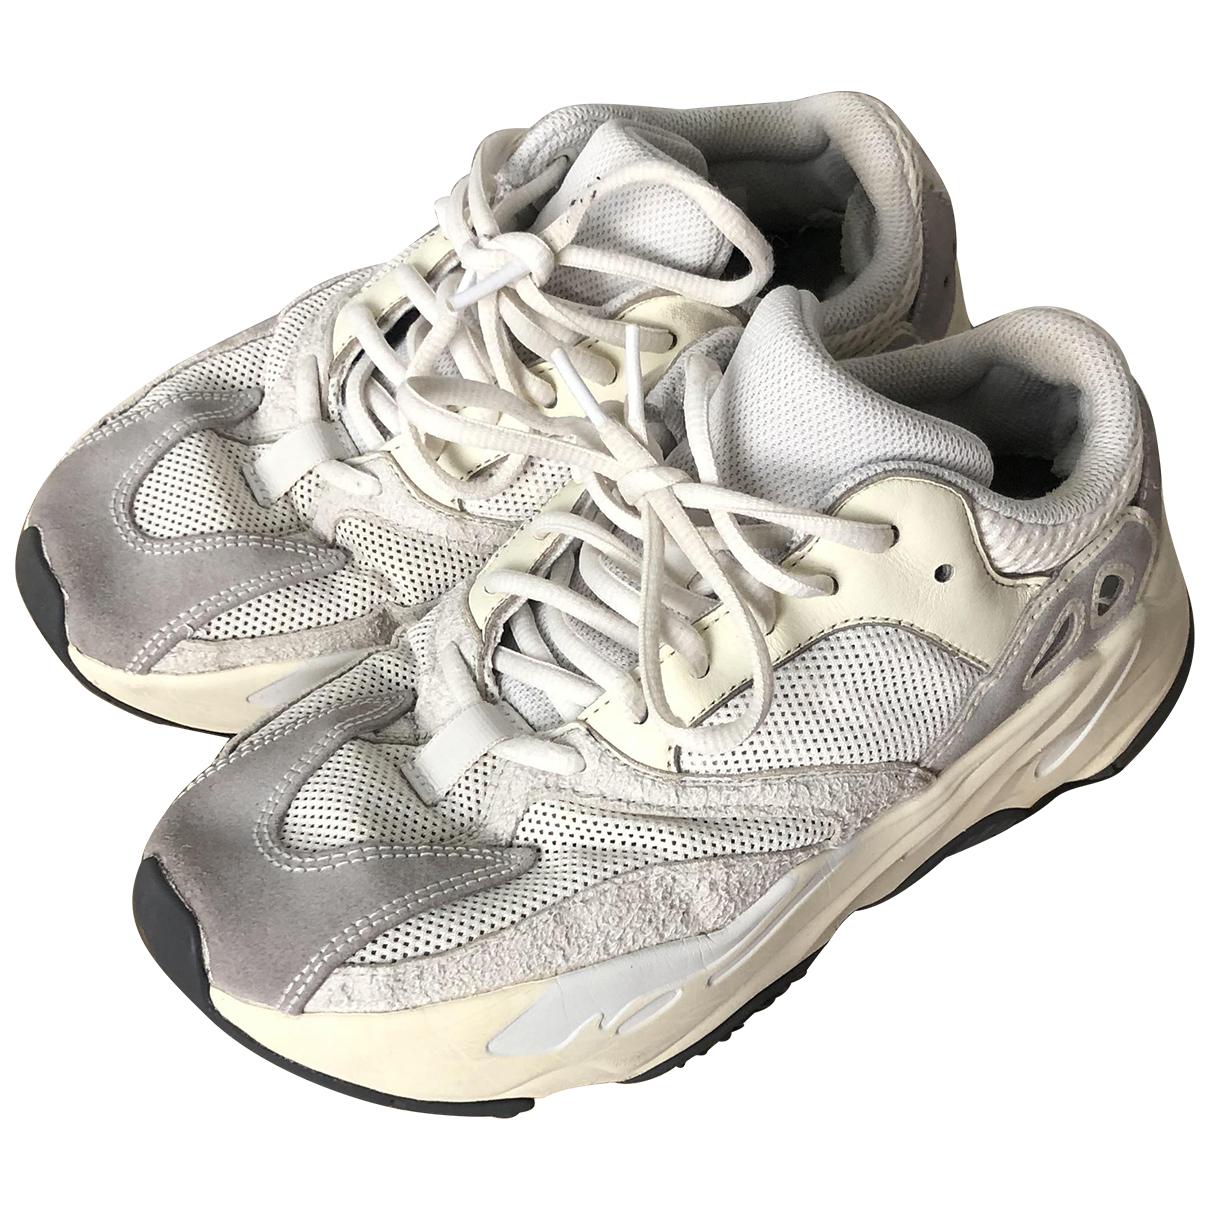 Yeezy X Adidas - Baskets Boost 700 V1  pour femme en toile - blanc